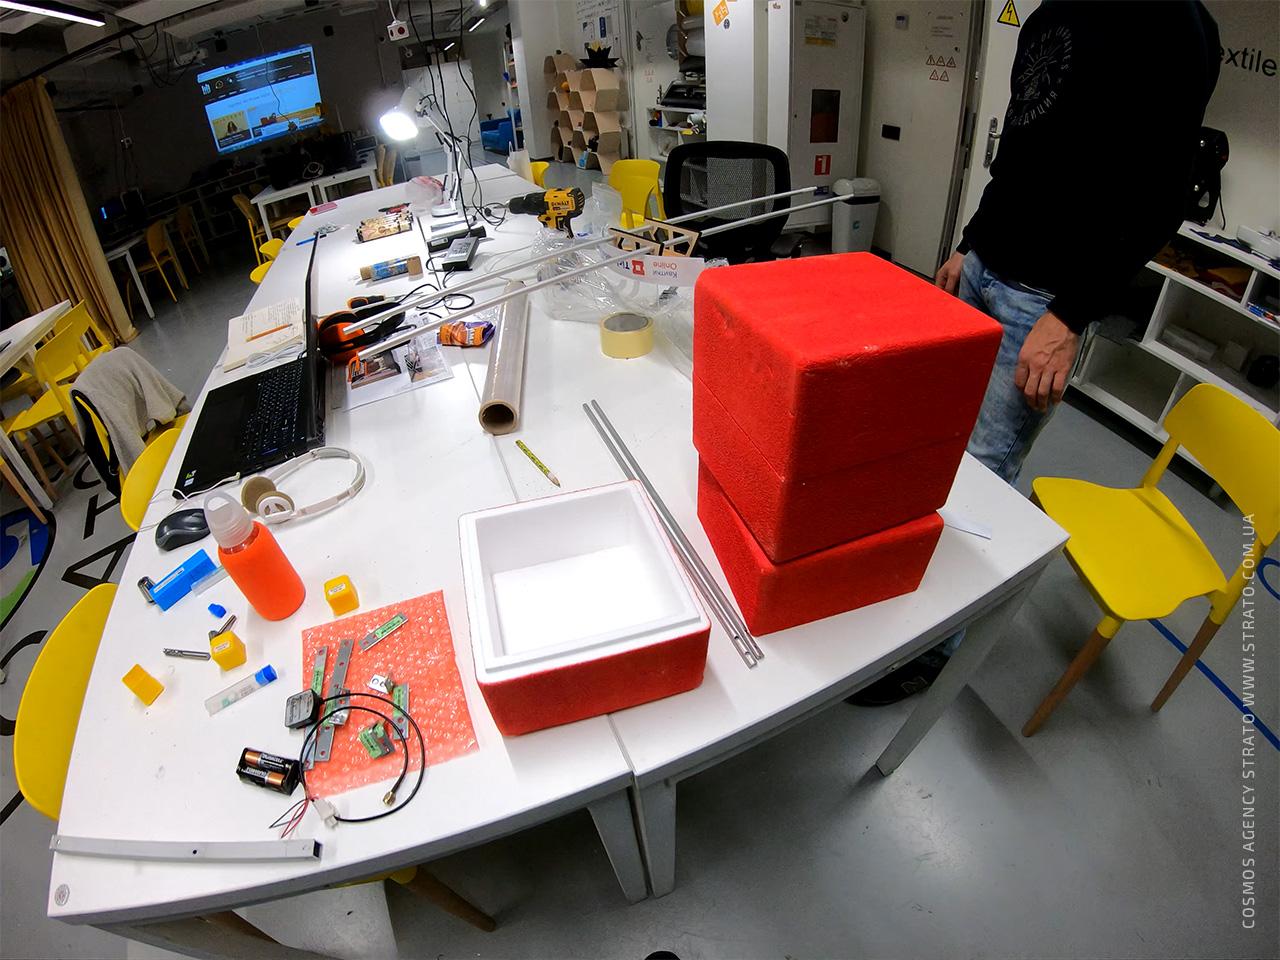 Сборка конструкции стратостата в лаборатории FabLab